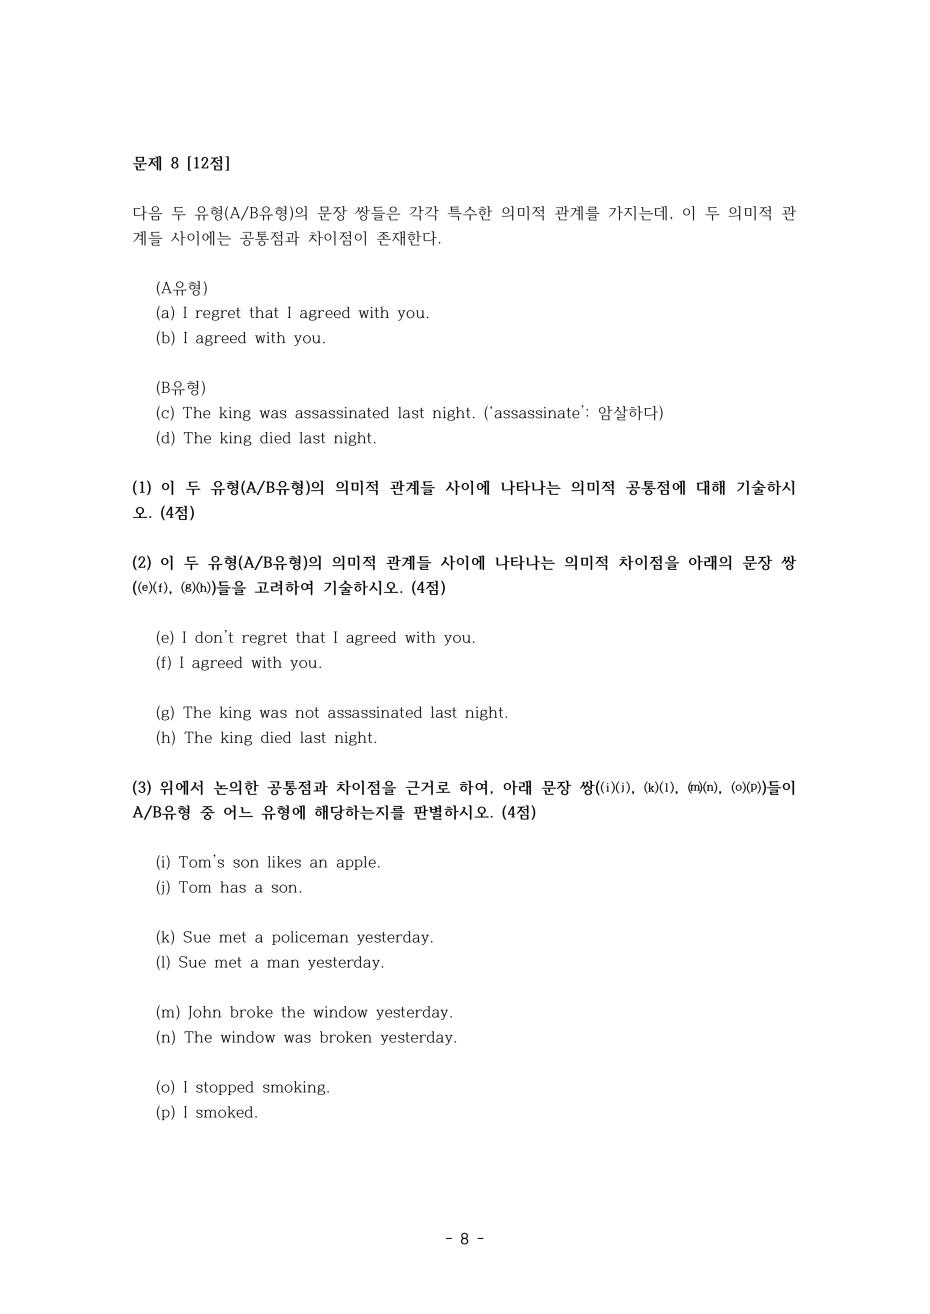 klo-2017-09